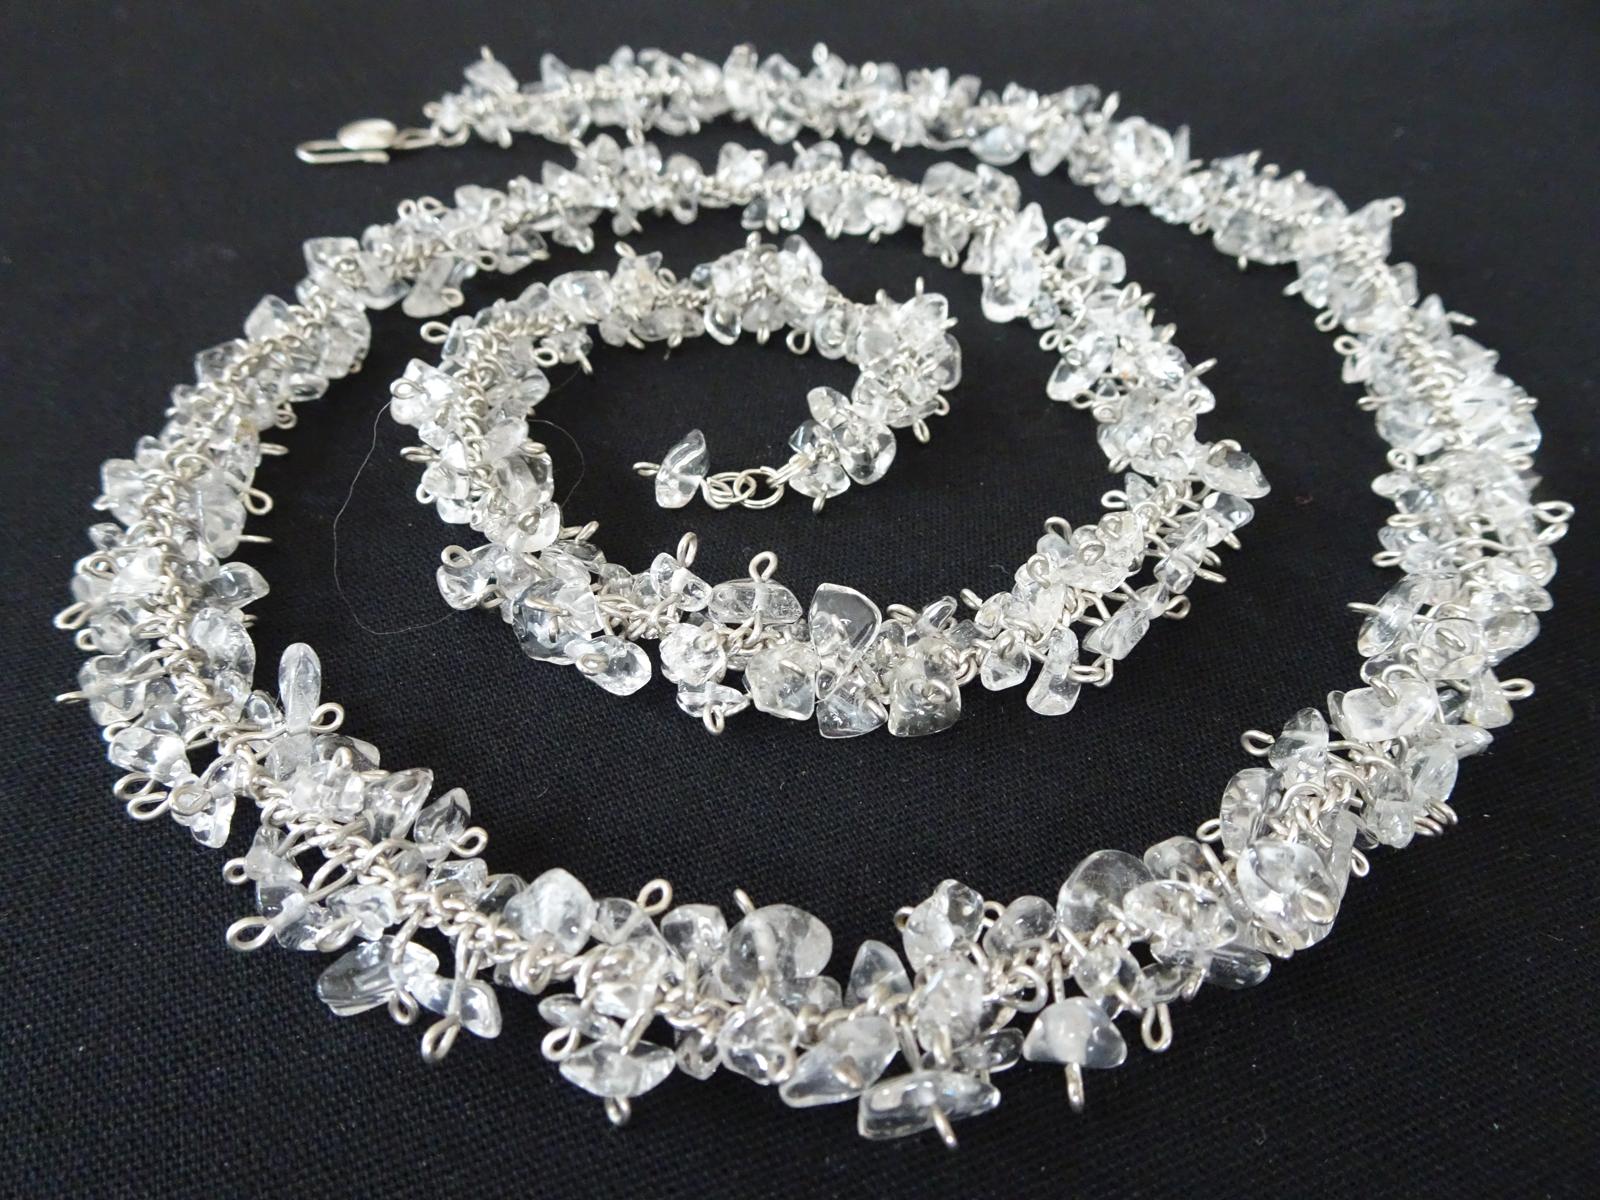 Snow Flakes 2005  Necklace  Quartz, Sterling Silver